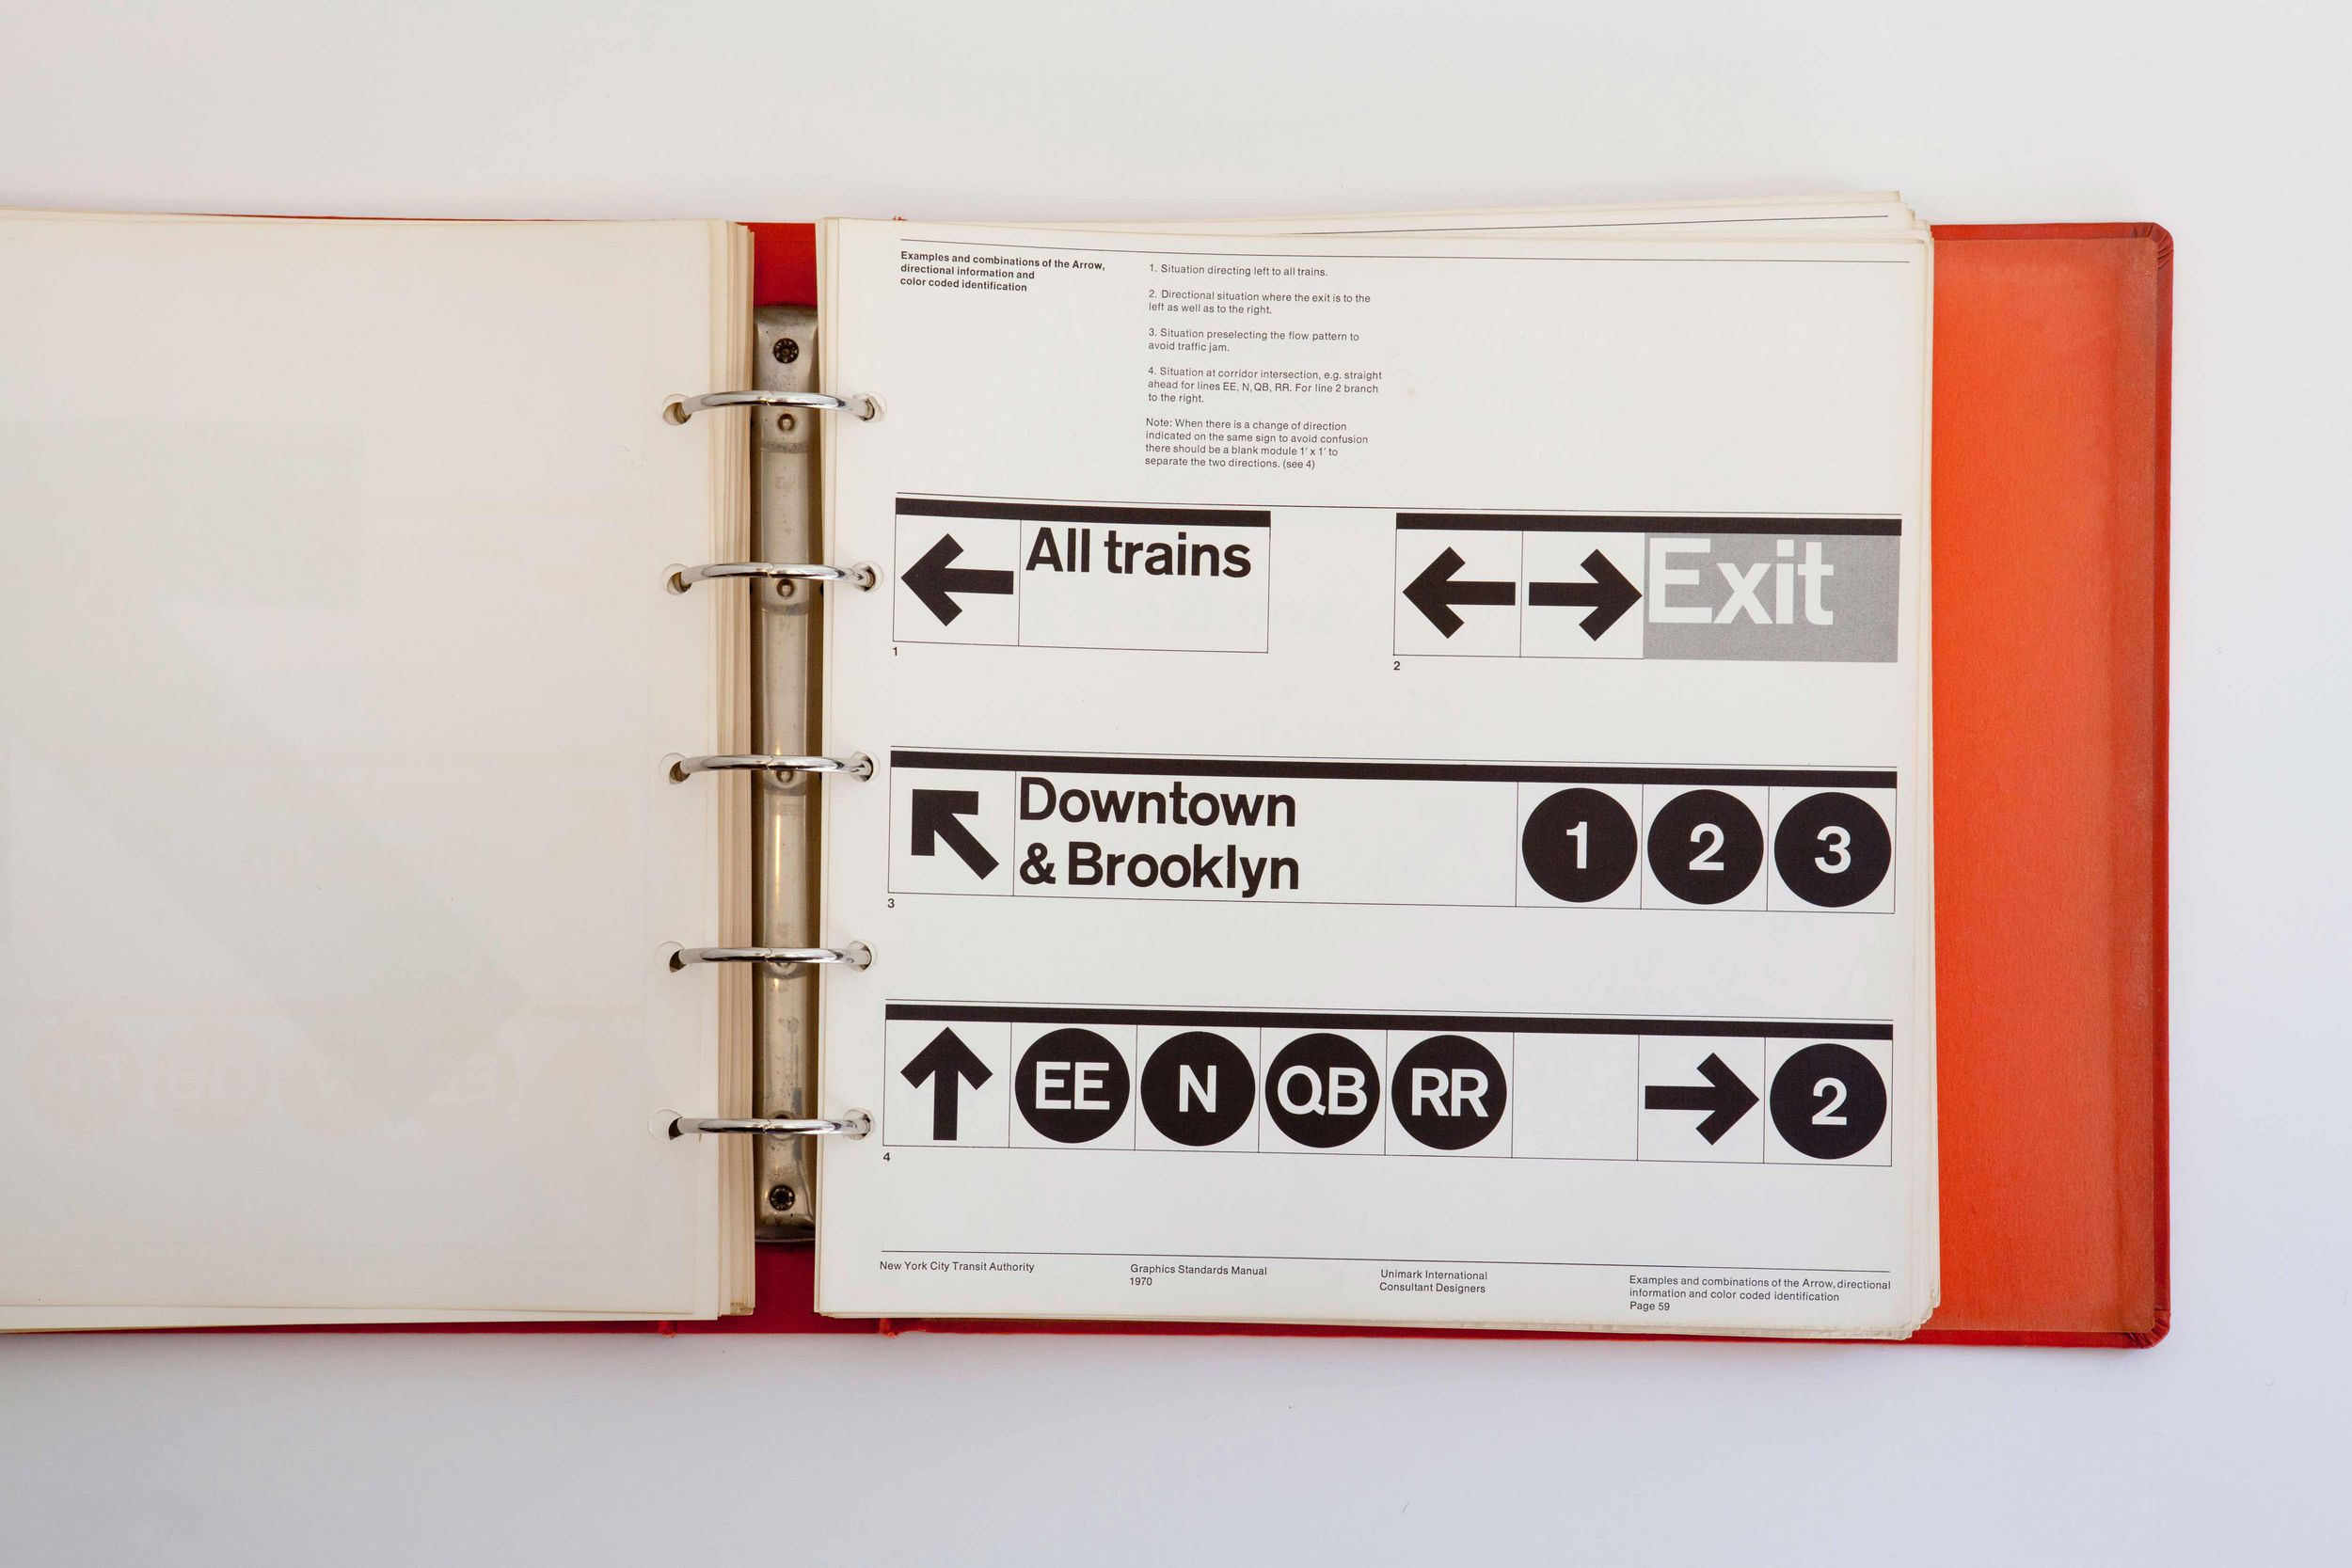 barrier-free design guide 2017 pdf